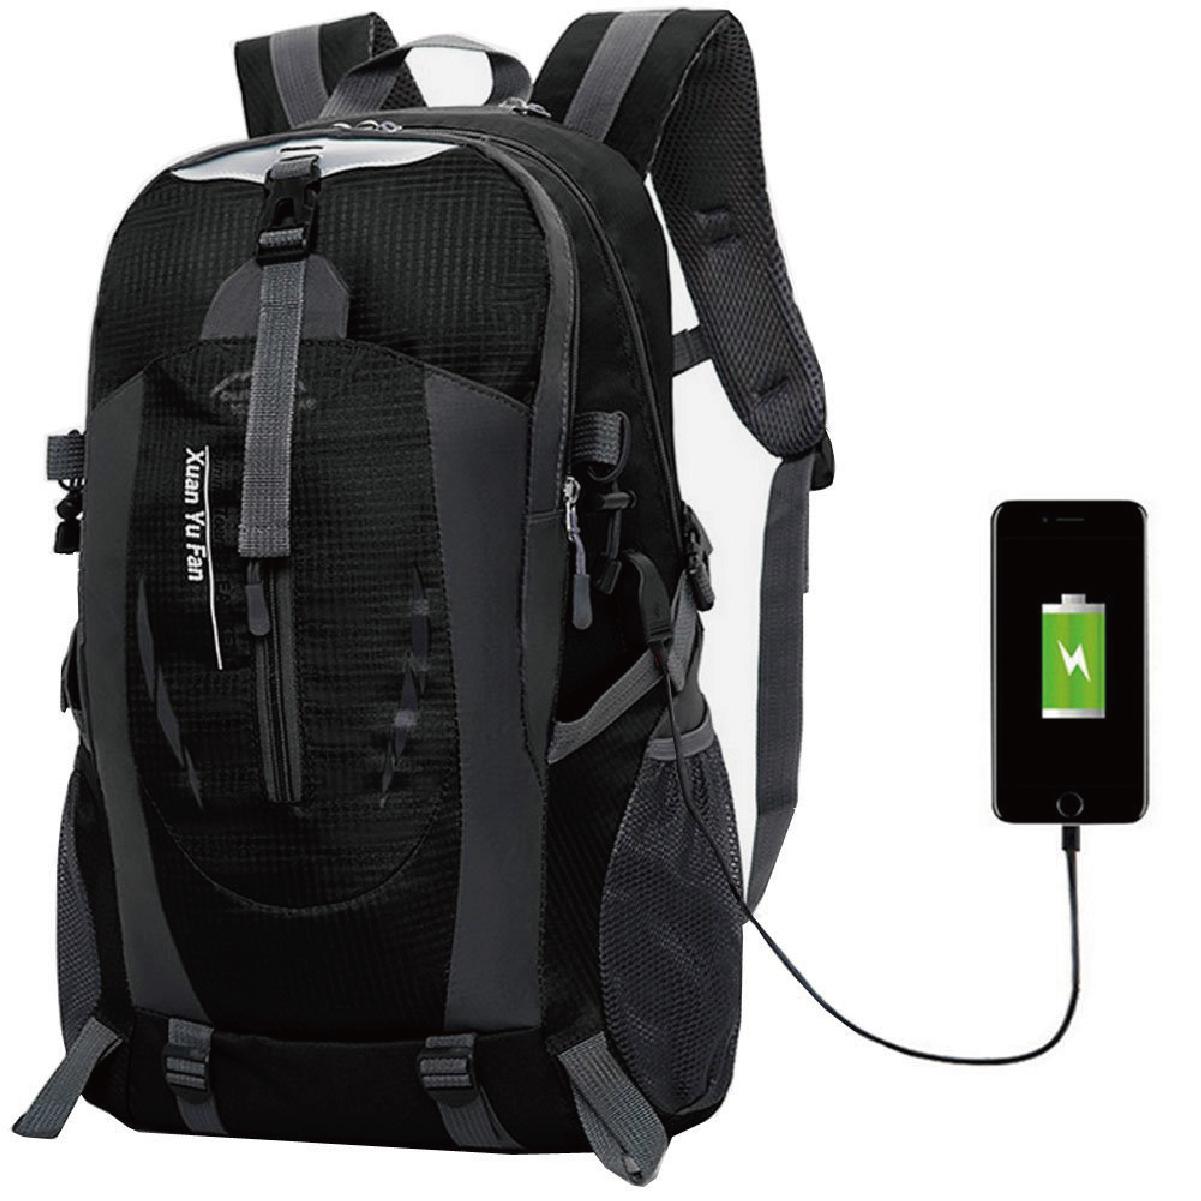 FOX FOUND リュック 大容量 USB充電ポート バックパック メンズ 15.6インチノートPC収納 登山 防水 アウトドア